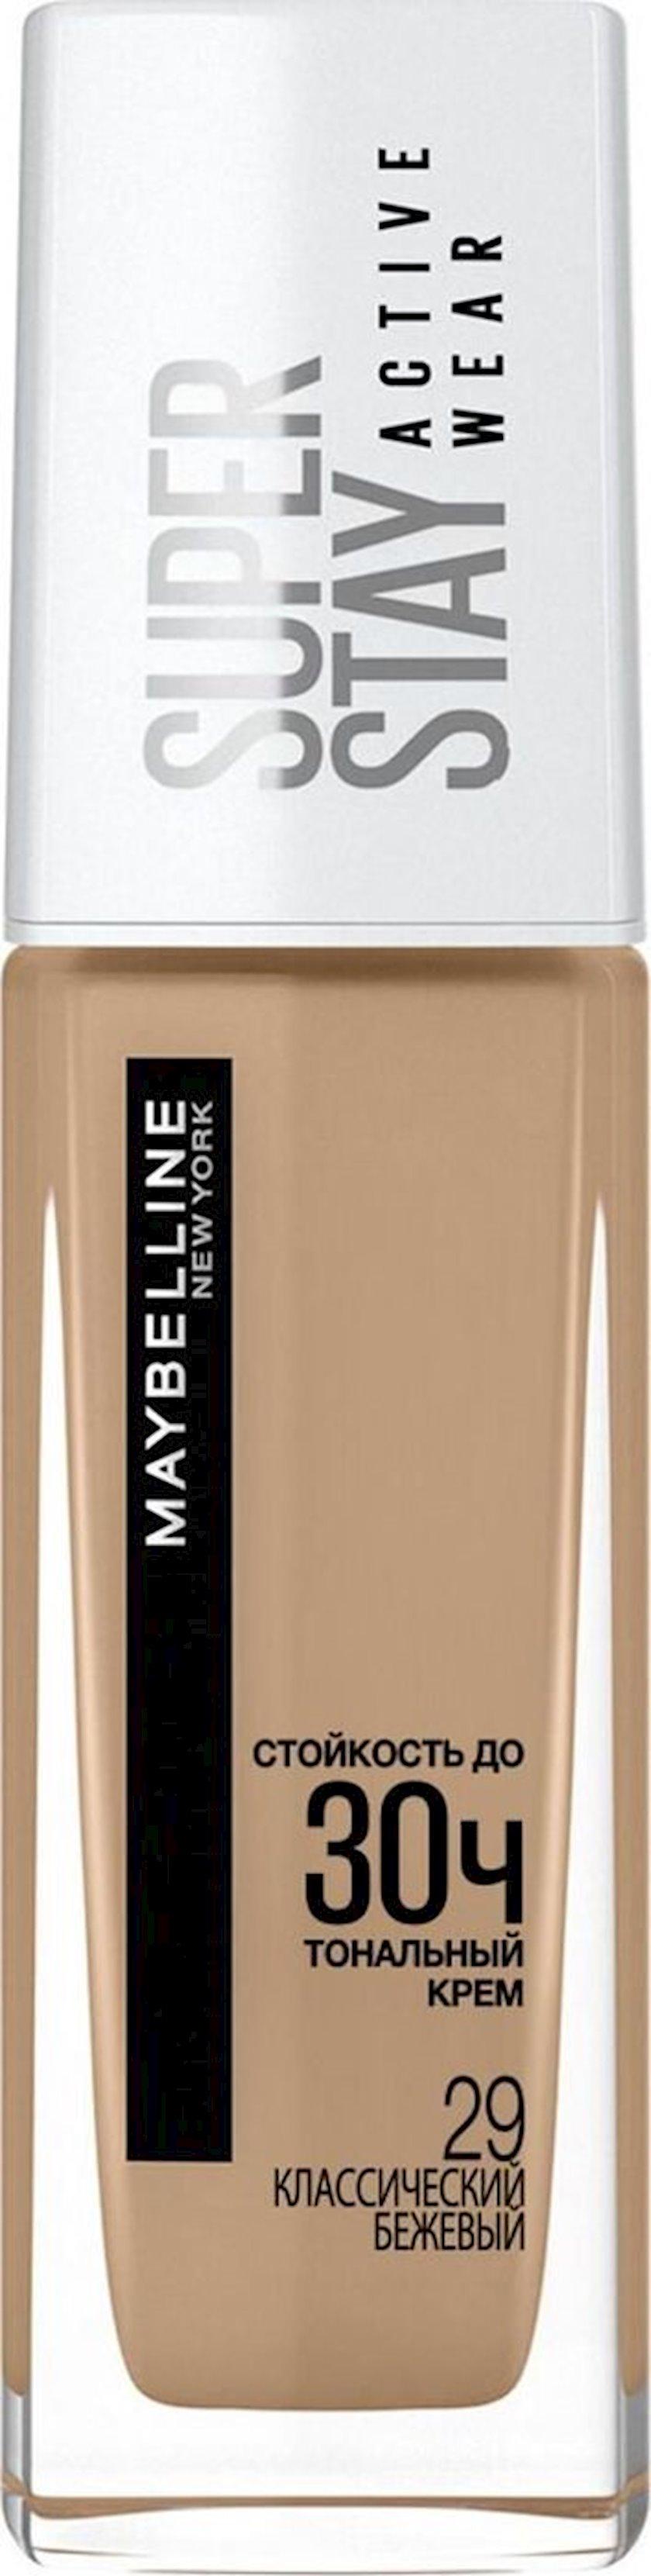 Tonal krem Maybelline Super Stay Active Wear 30 s, çalar 29 Klassik bej, 30 ml